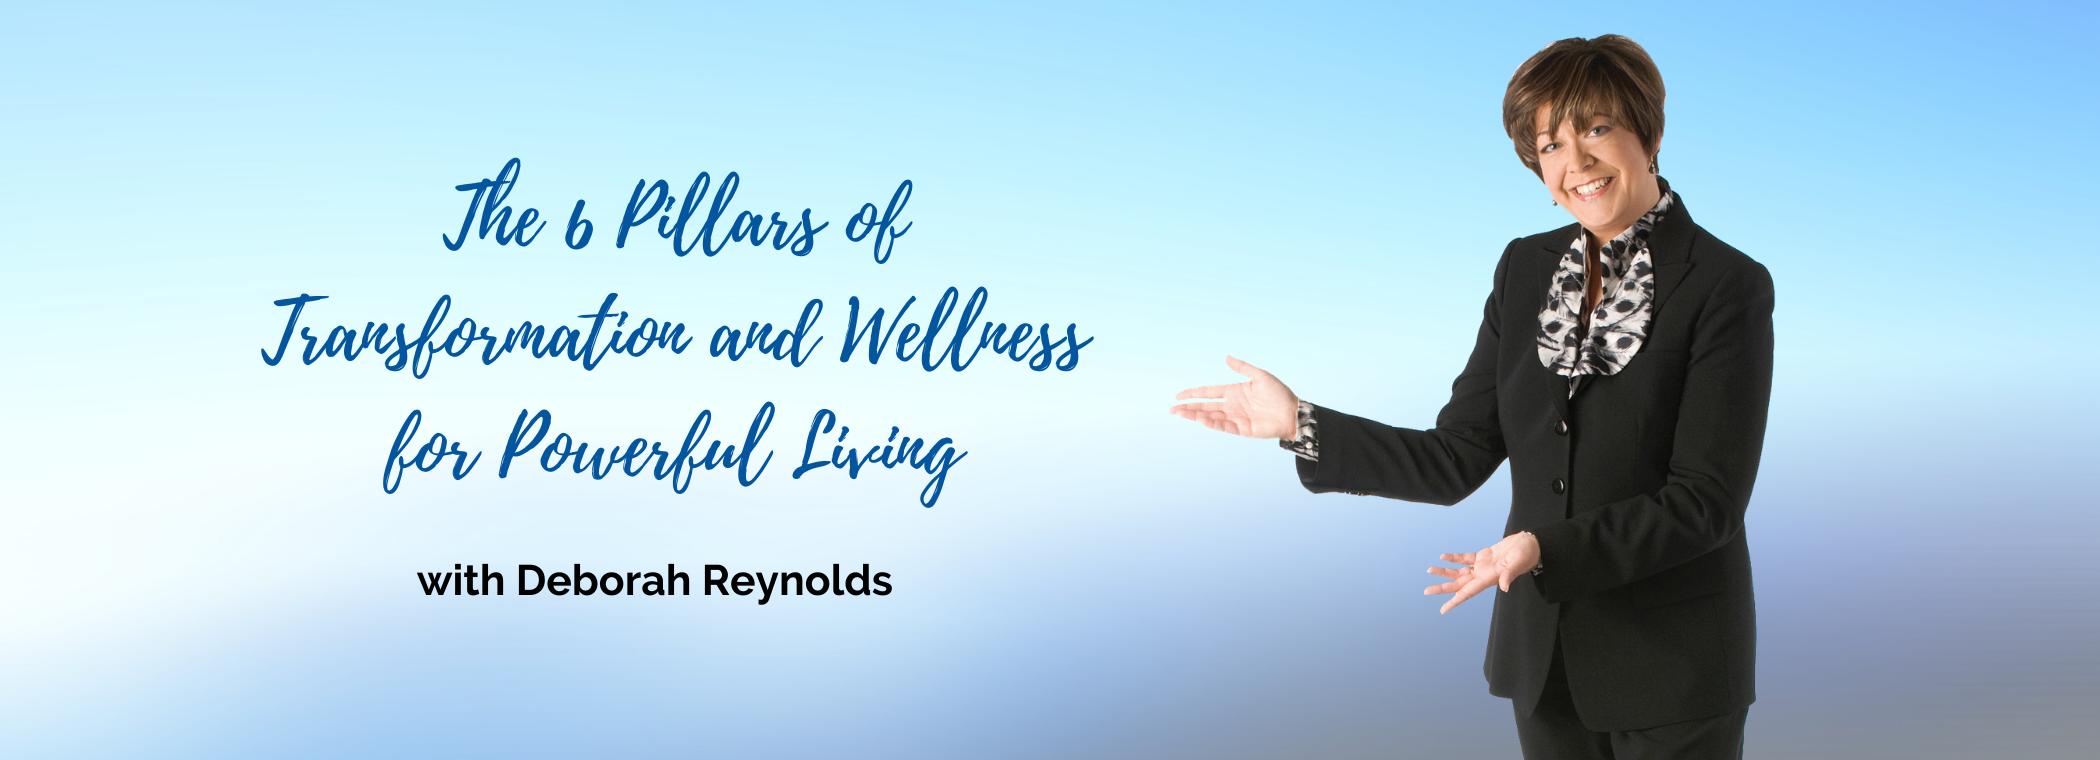 6 Pillars of Transformation and Wellness